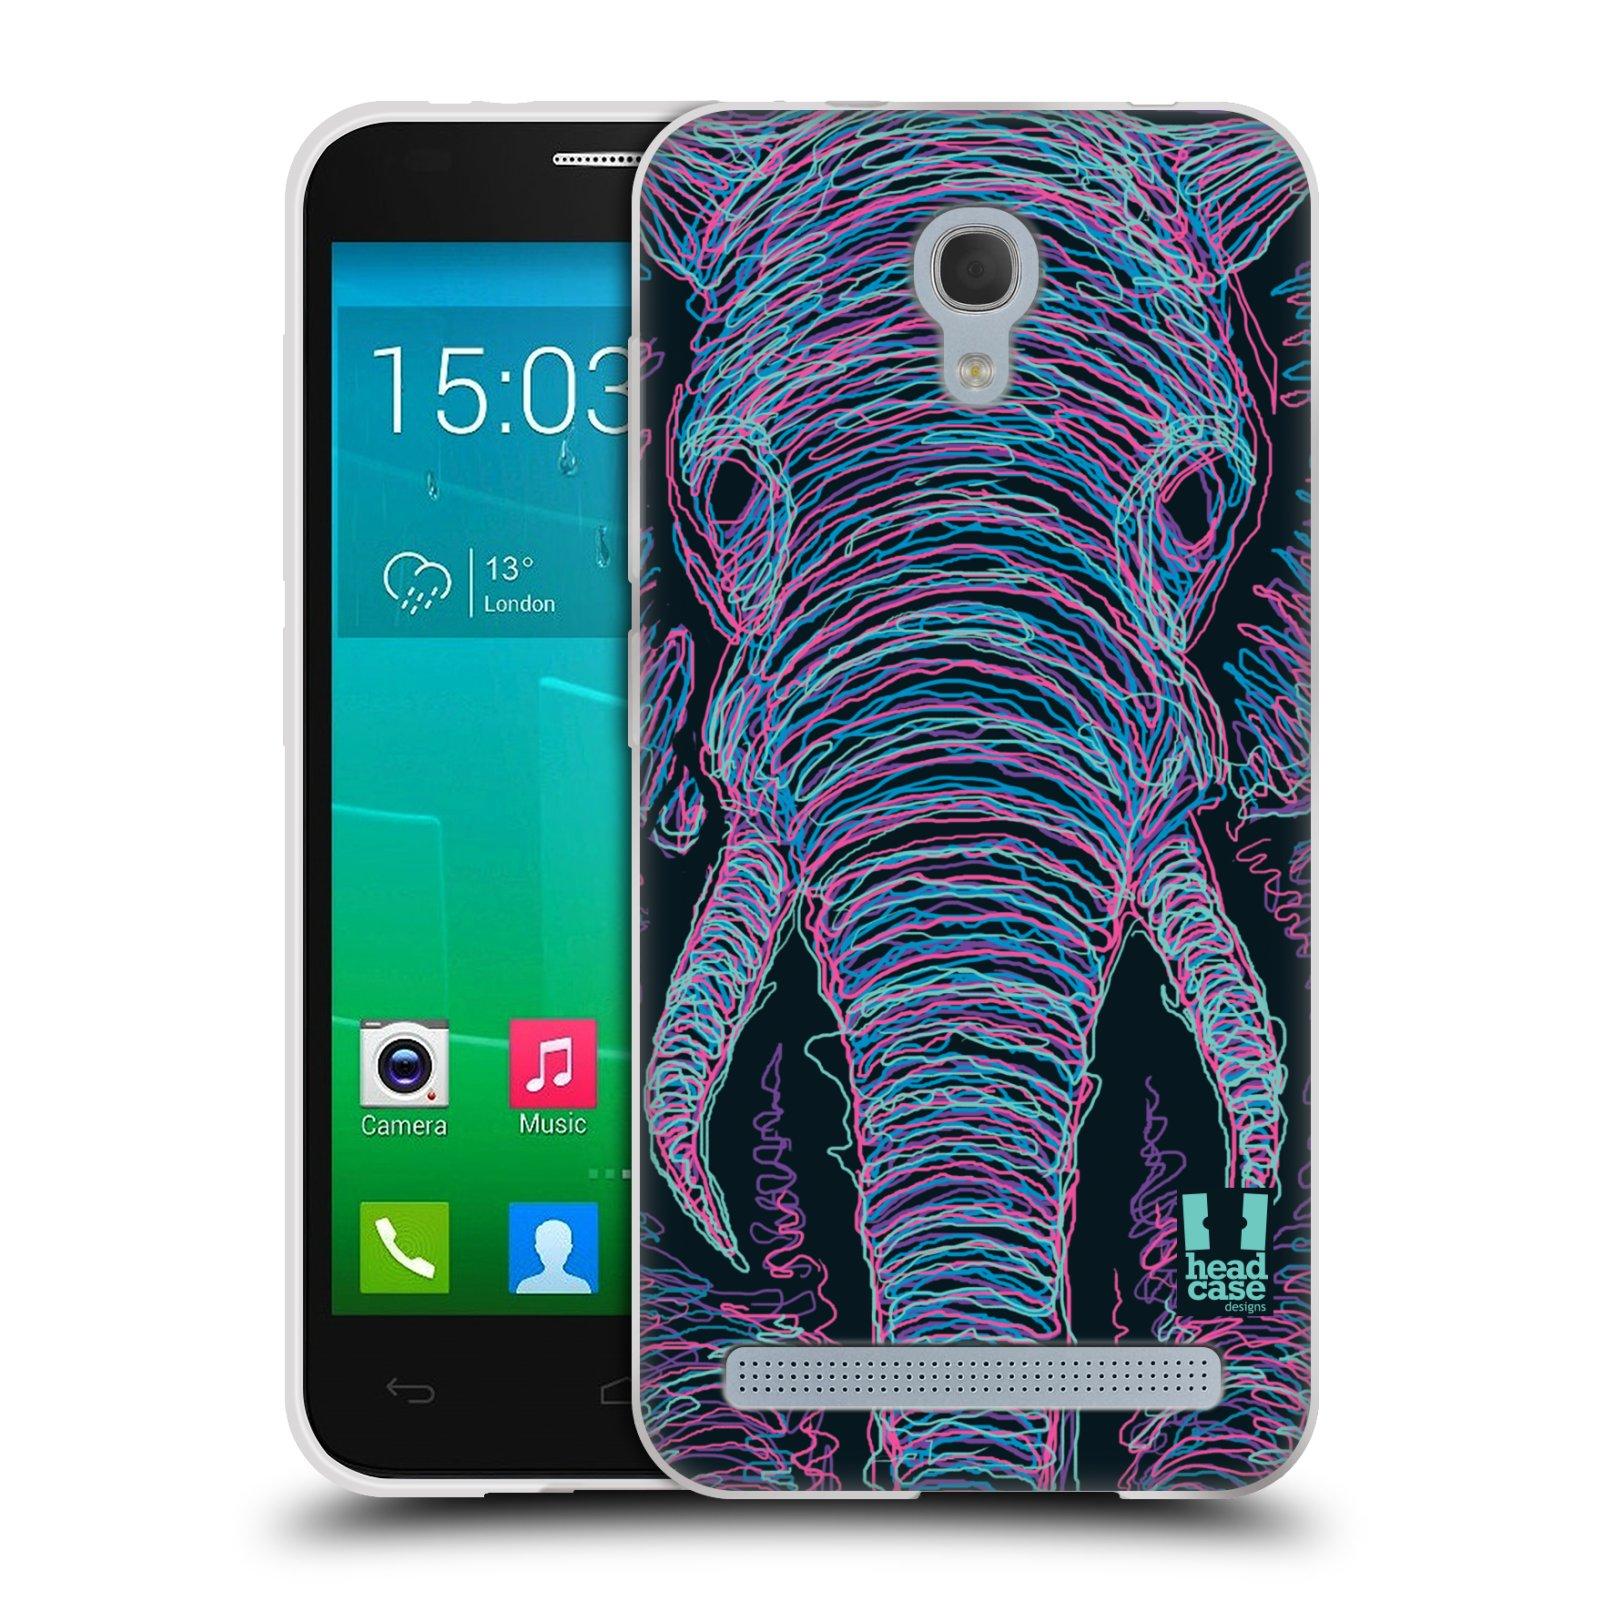 HEAD CASE silikonový obal na mobil Alcatel Idol 2 MINI S 6036Y vzor zvíře čmáranice slon